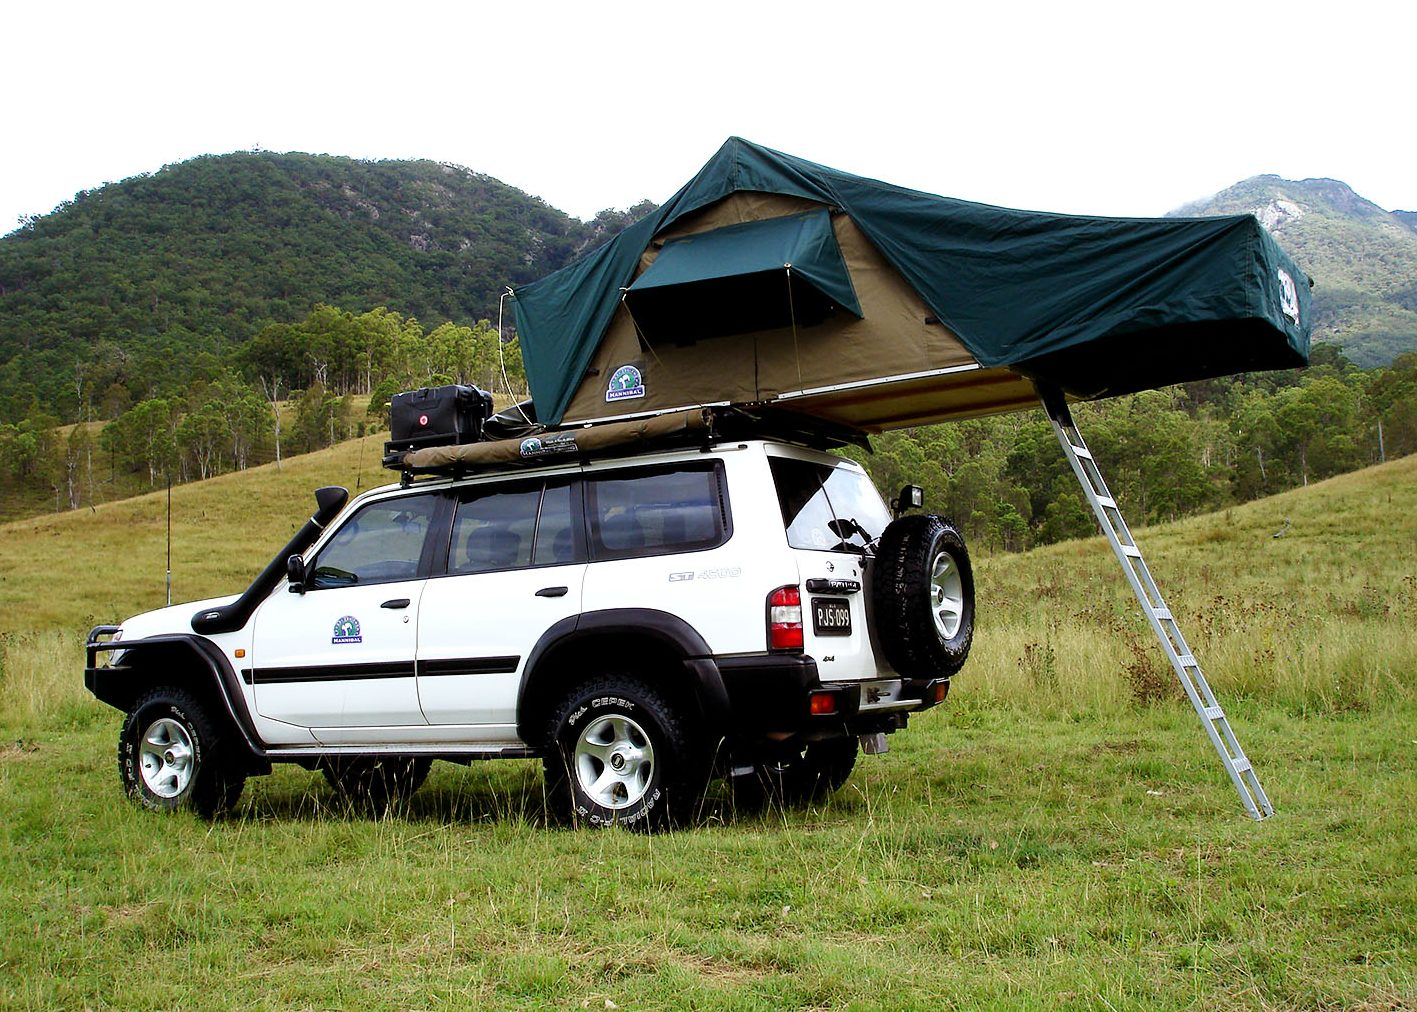 Hannibal Safari Equipment - Classic Tent with Jumbo Fly Sheet